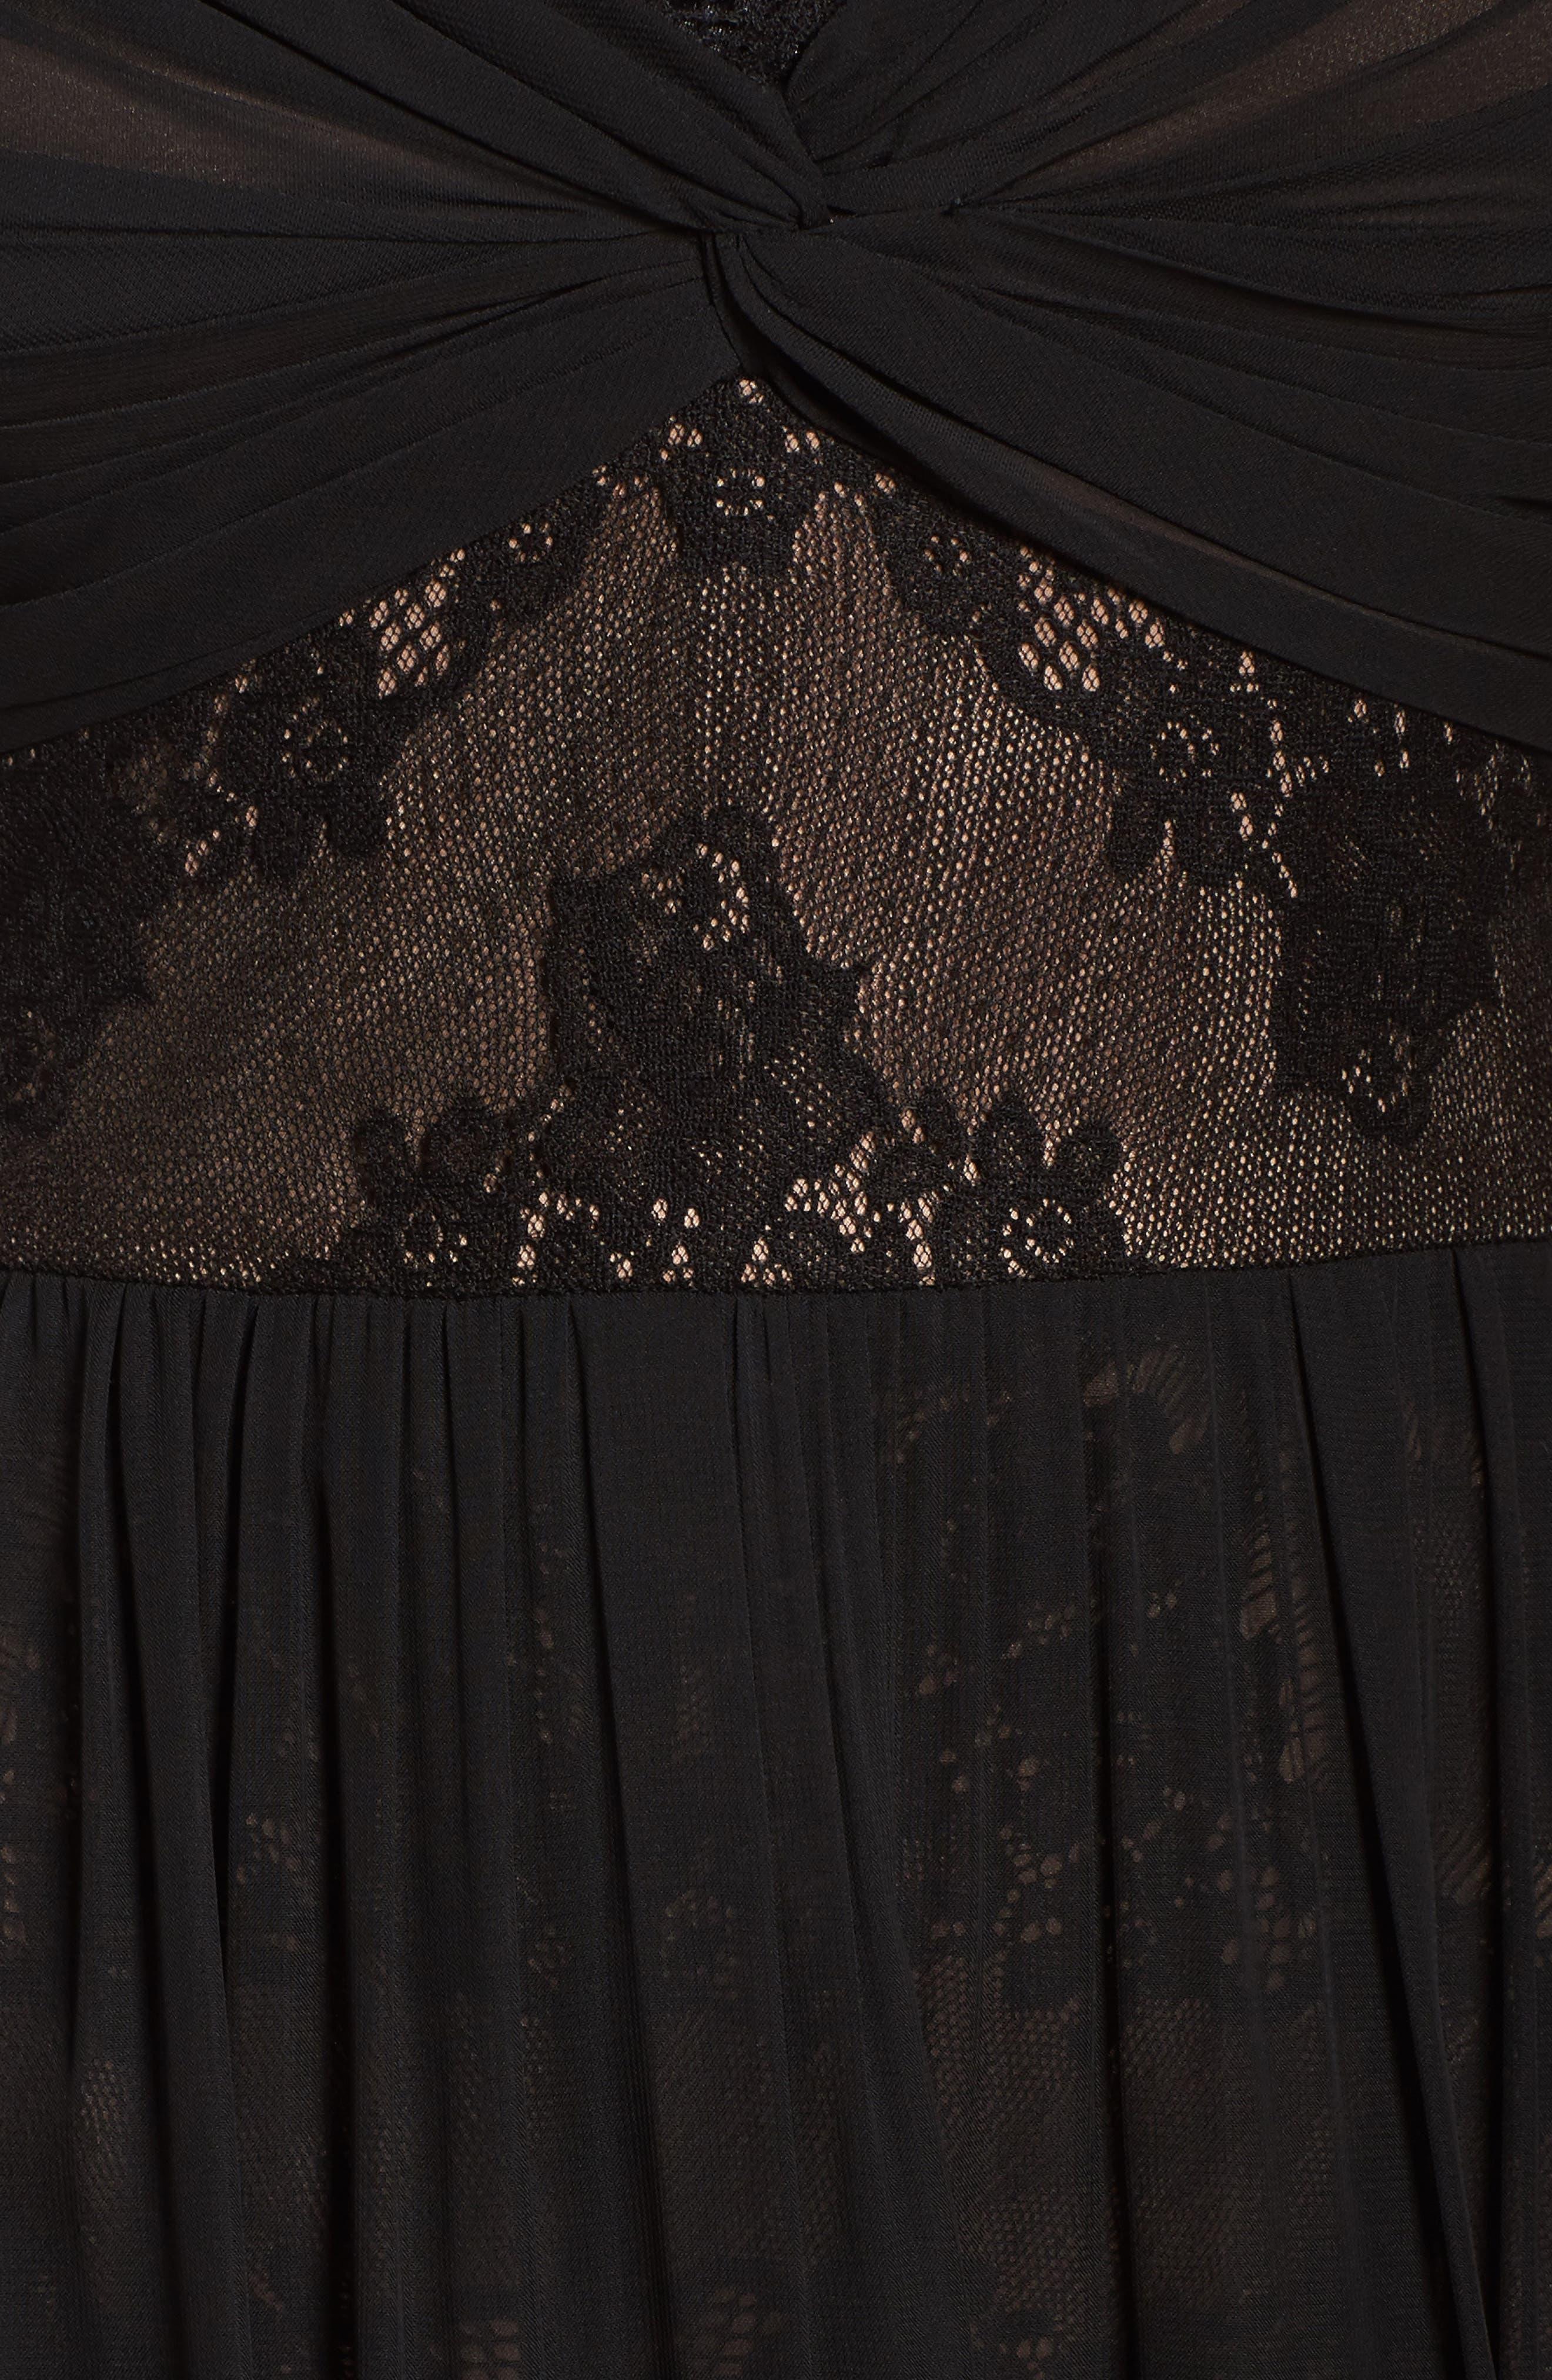 Lace Detail Gown,                             Alternate thumbnail 5, color,                             Black Nude